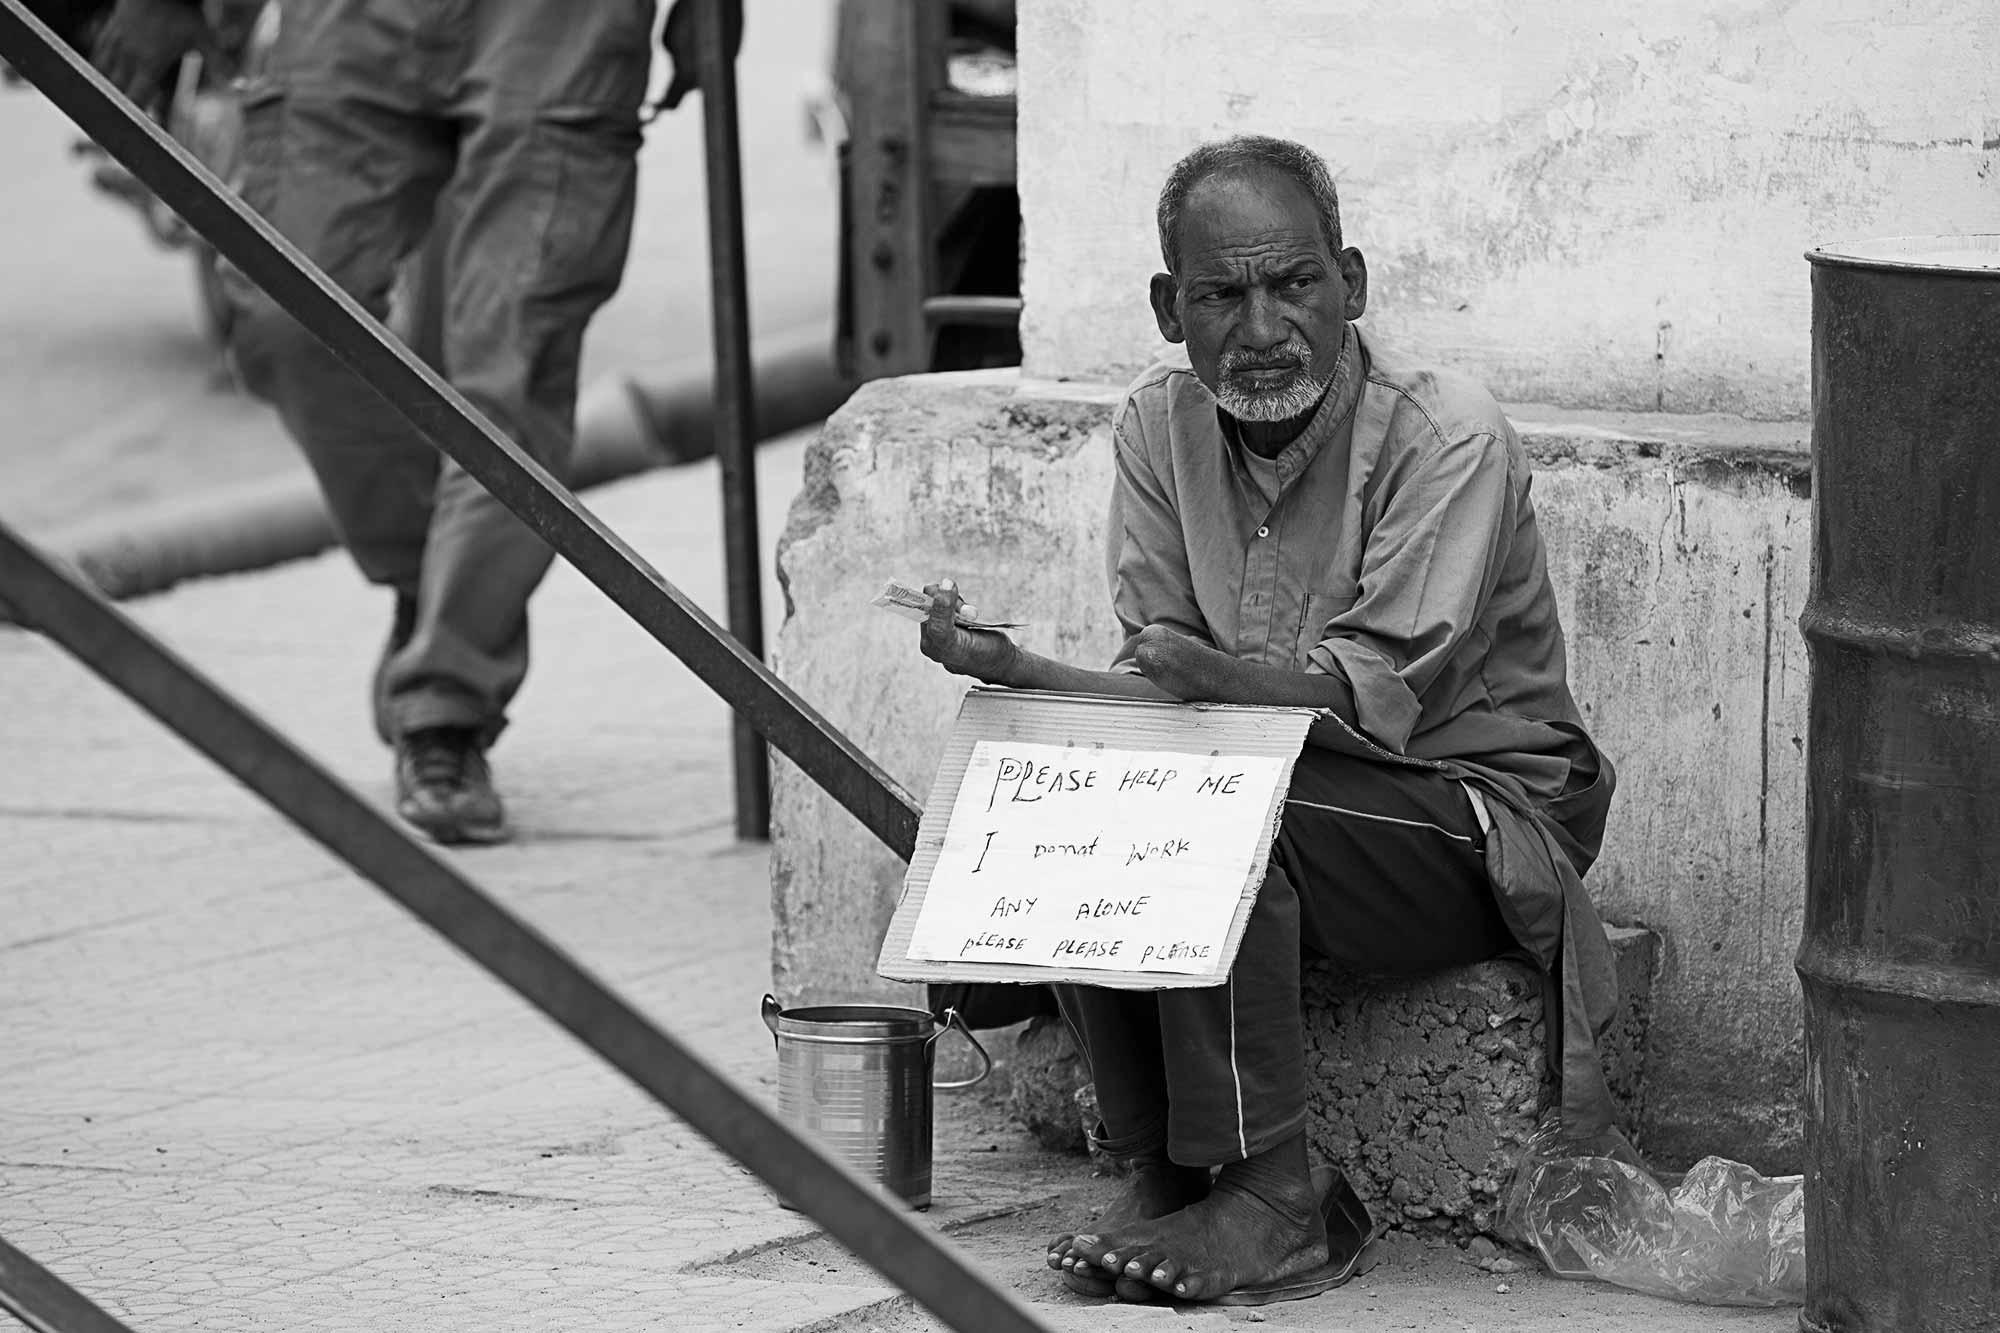 disfigured-man-visakhapatnam-india